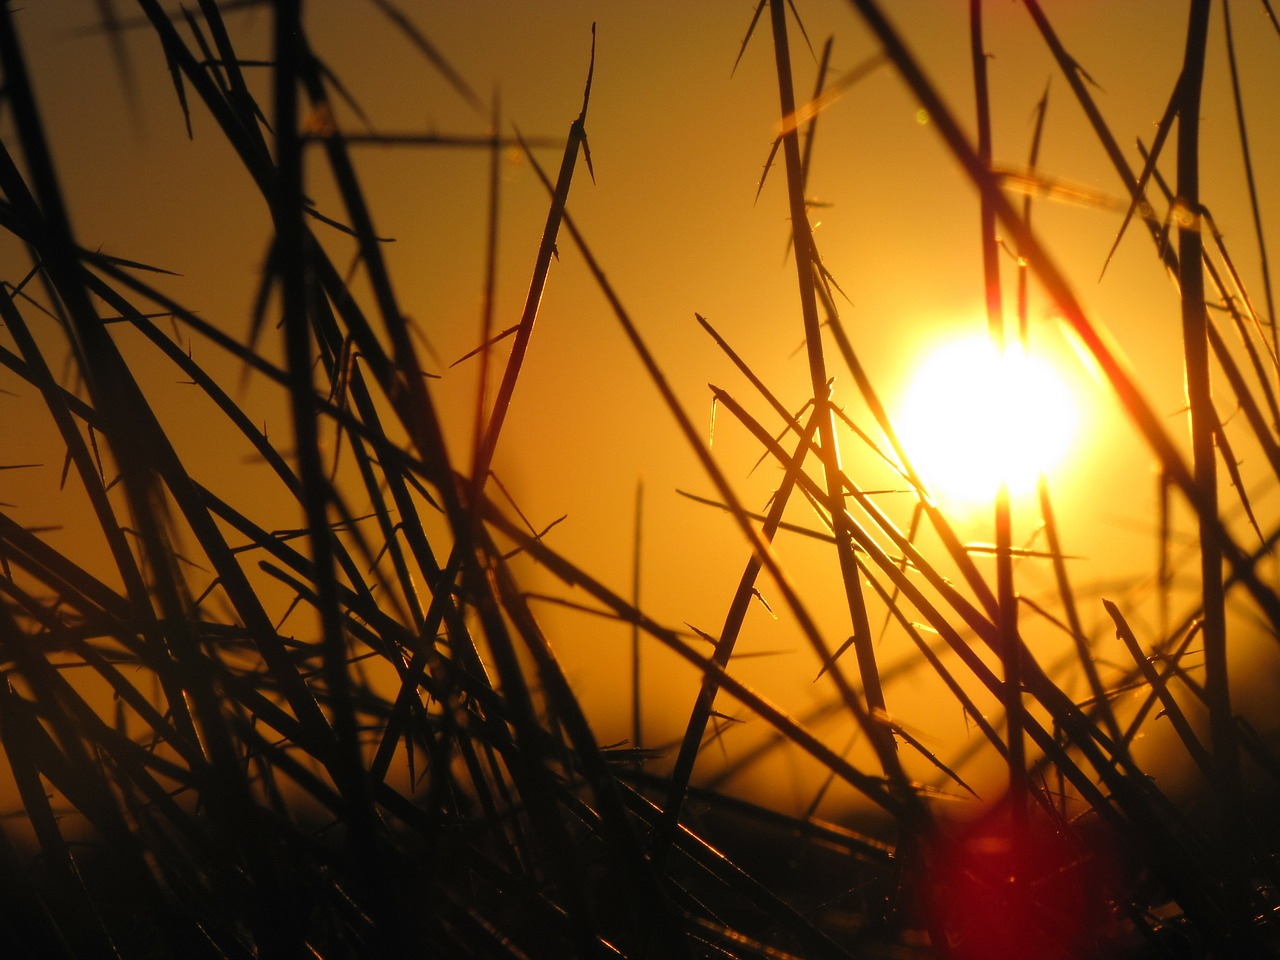 sunset-142186_1280